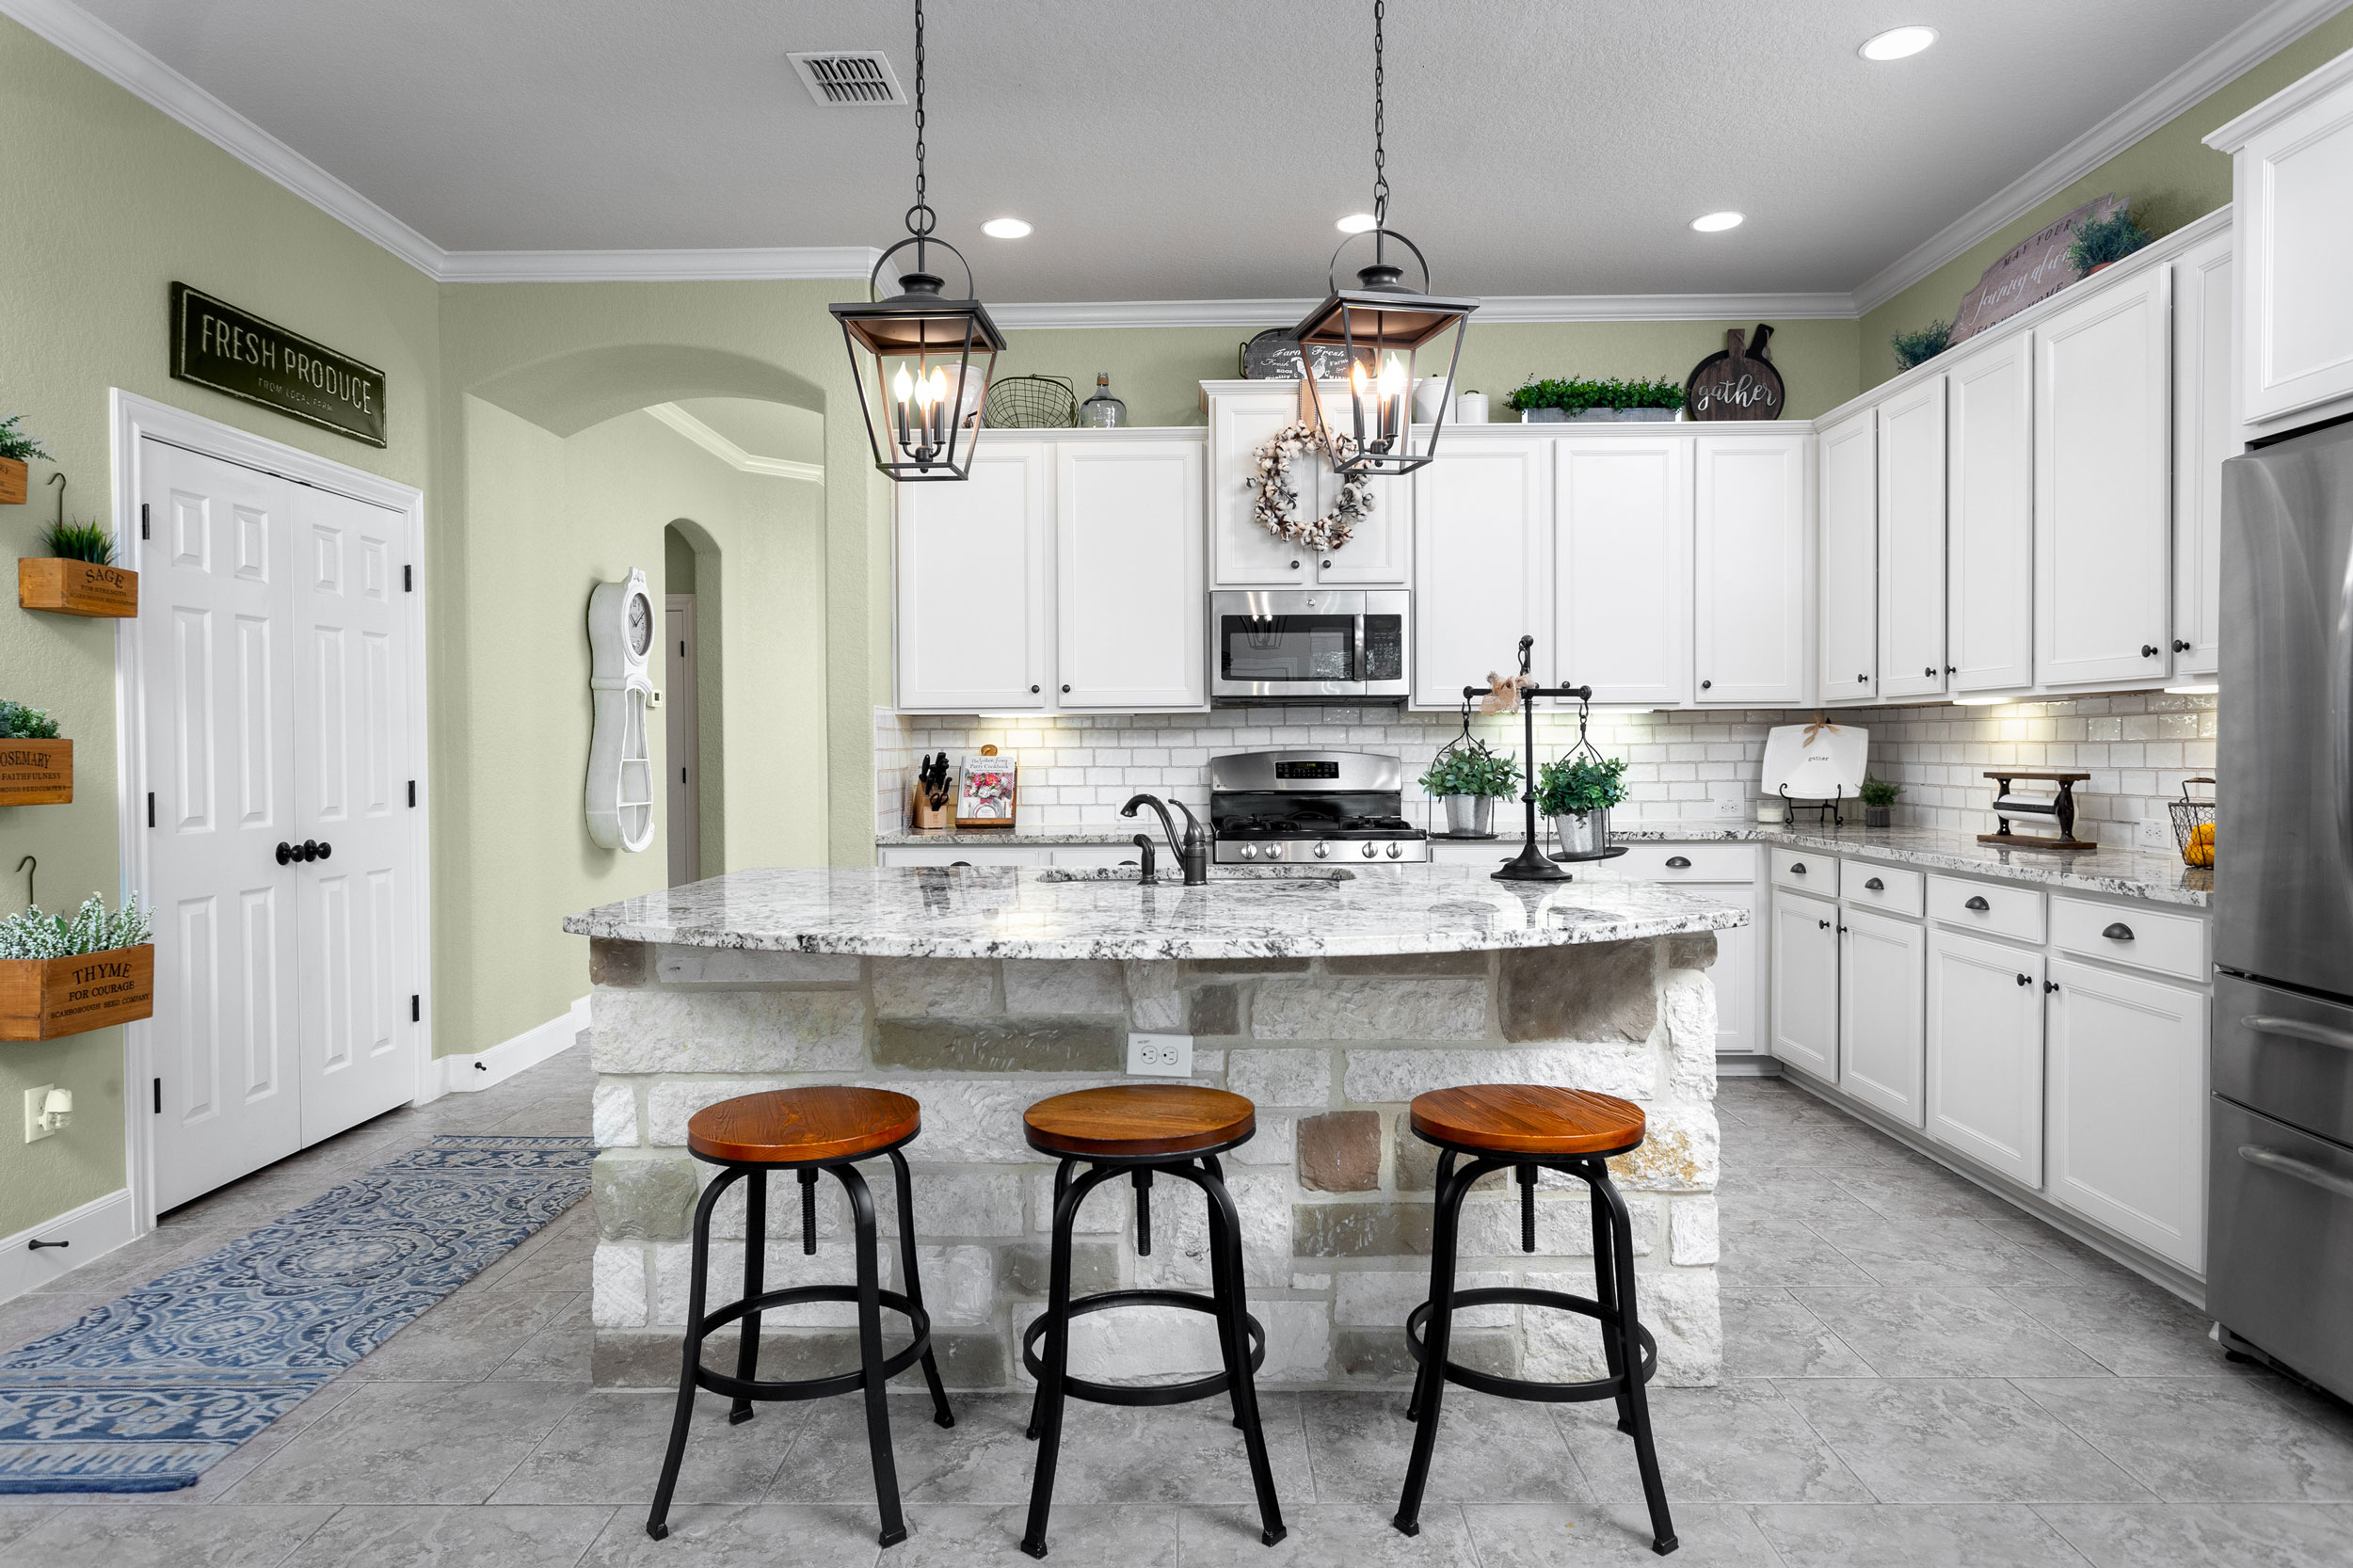 kitchen-design-pottery-barn.jpg